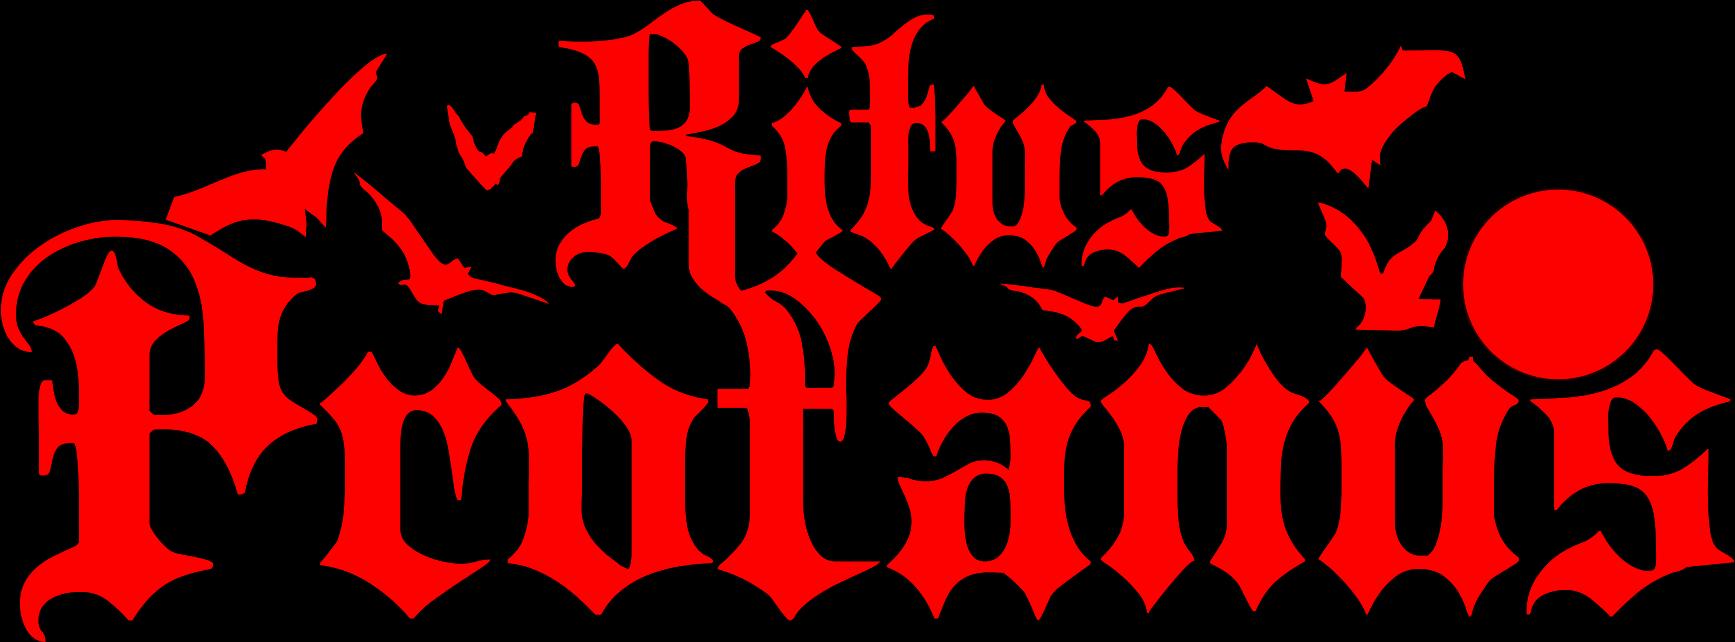 Ritus Profanus - Logo